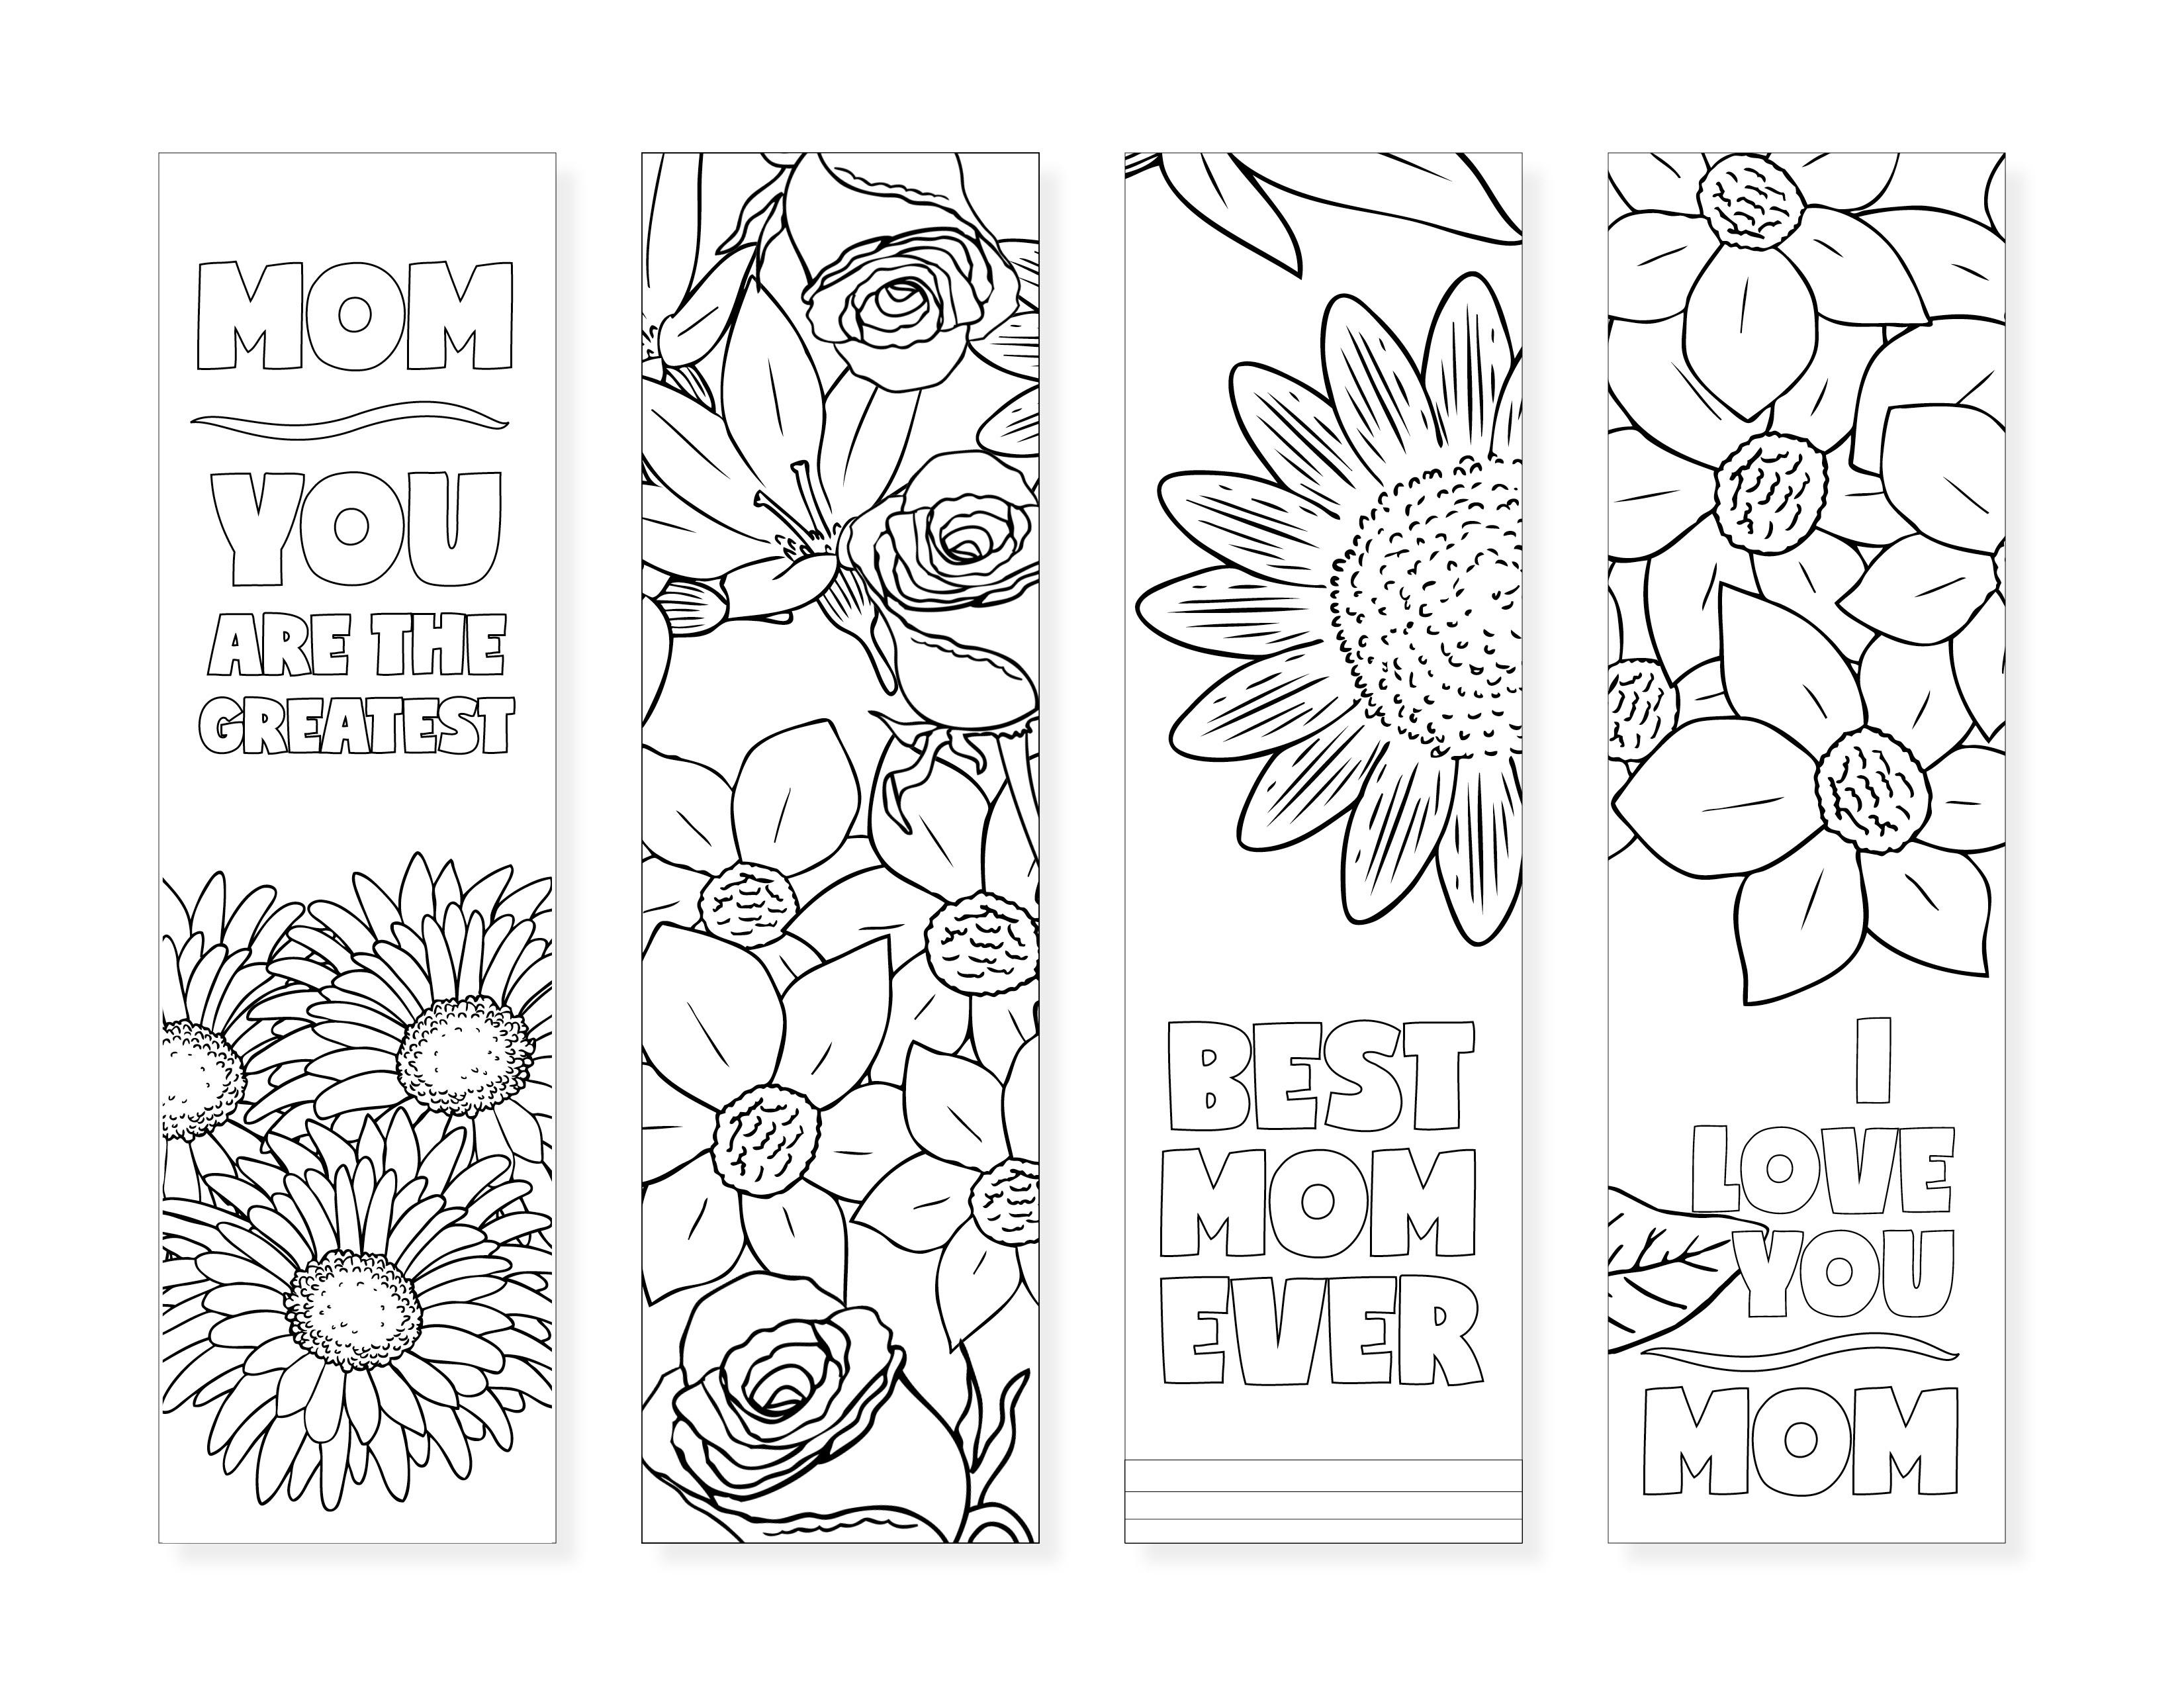 Free Printable Bookmarks For Moms - Design Dazzle - Free Printable Bookmarks To Color